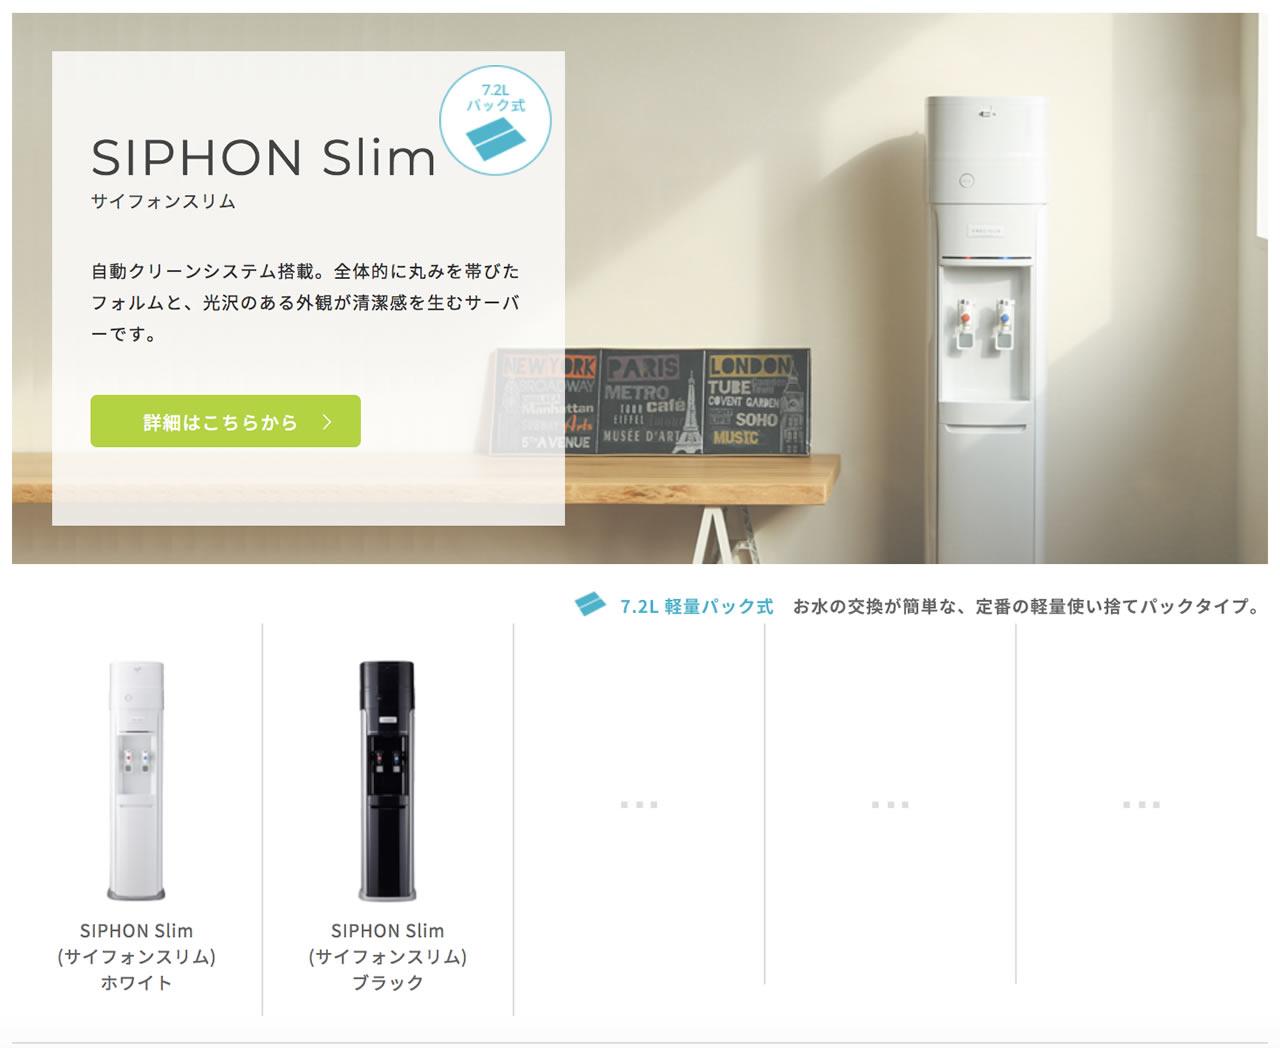 SIPHONE Slim(サイフォンスリム)のウォーターサーバー